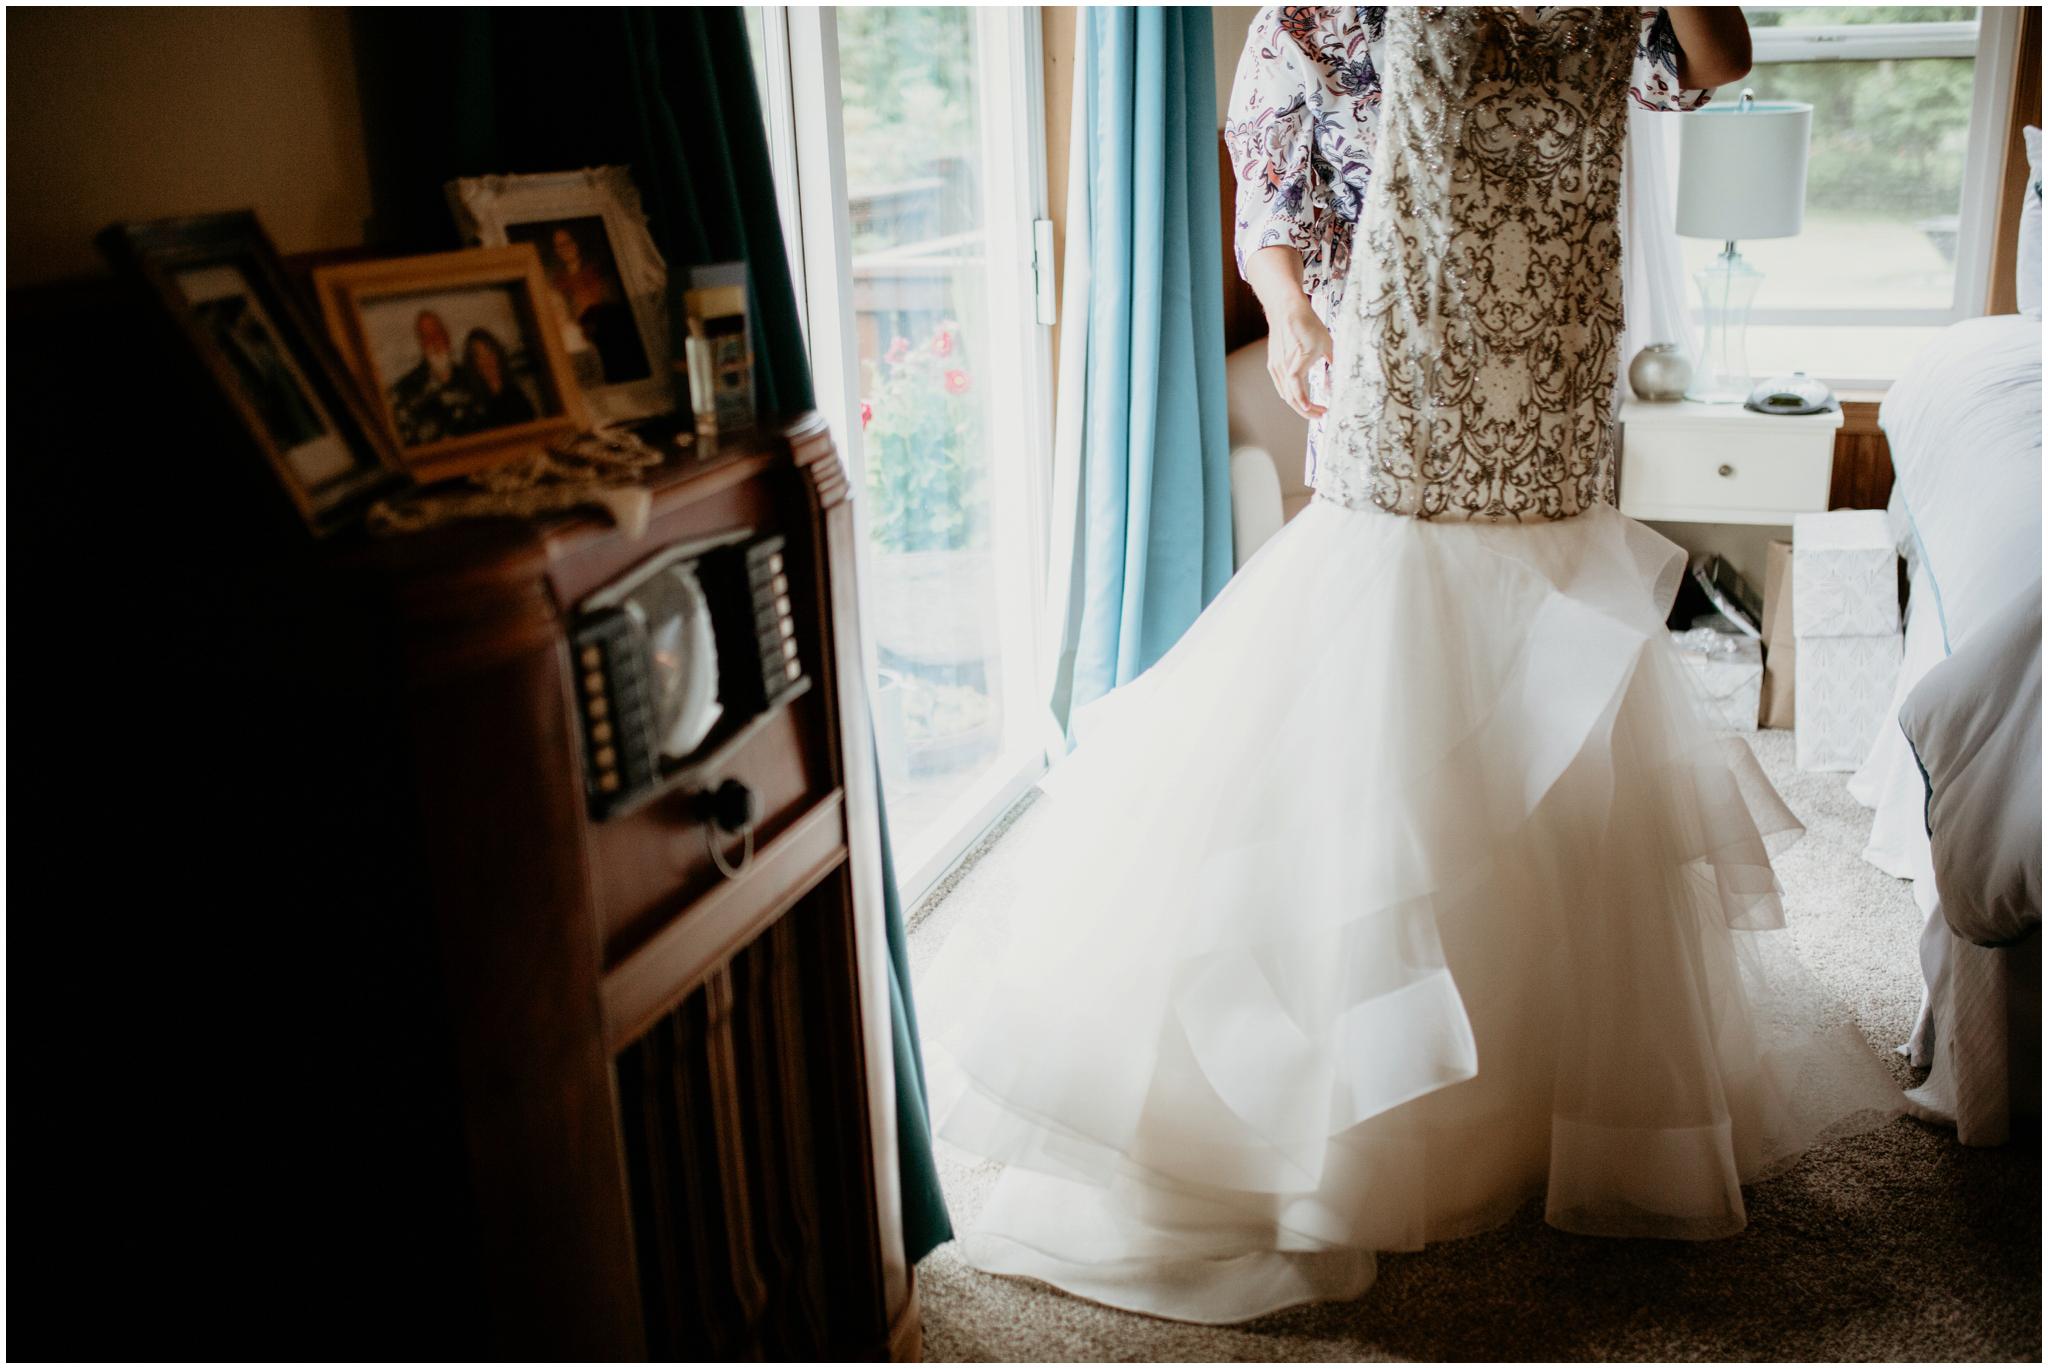 alex-and-matthew-three-cs-farm-venue-seattle-wedding-photographer-020.jpg